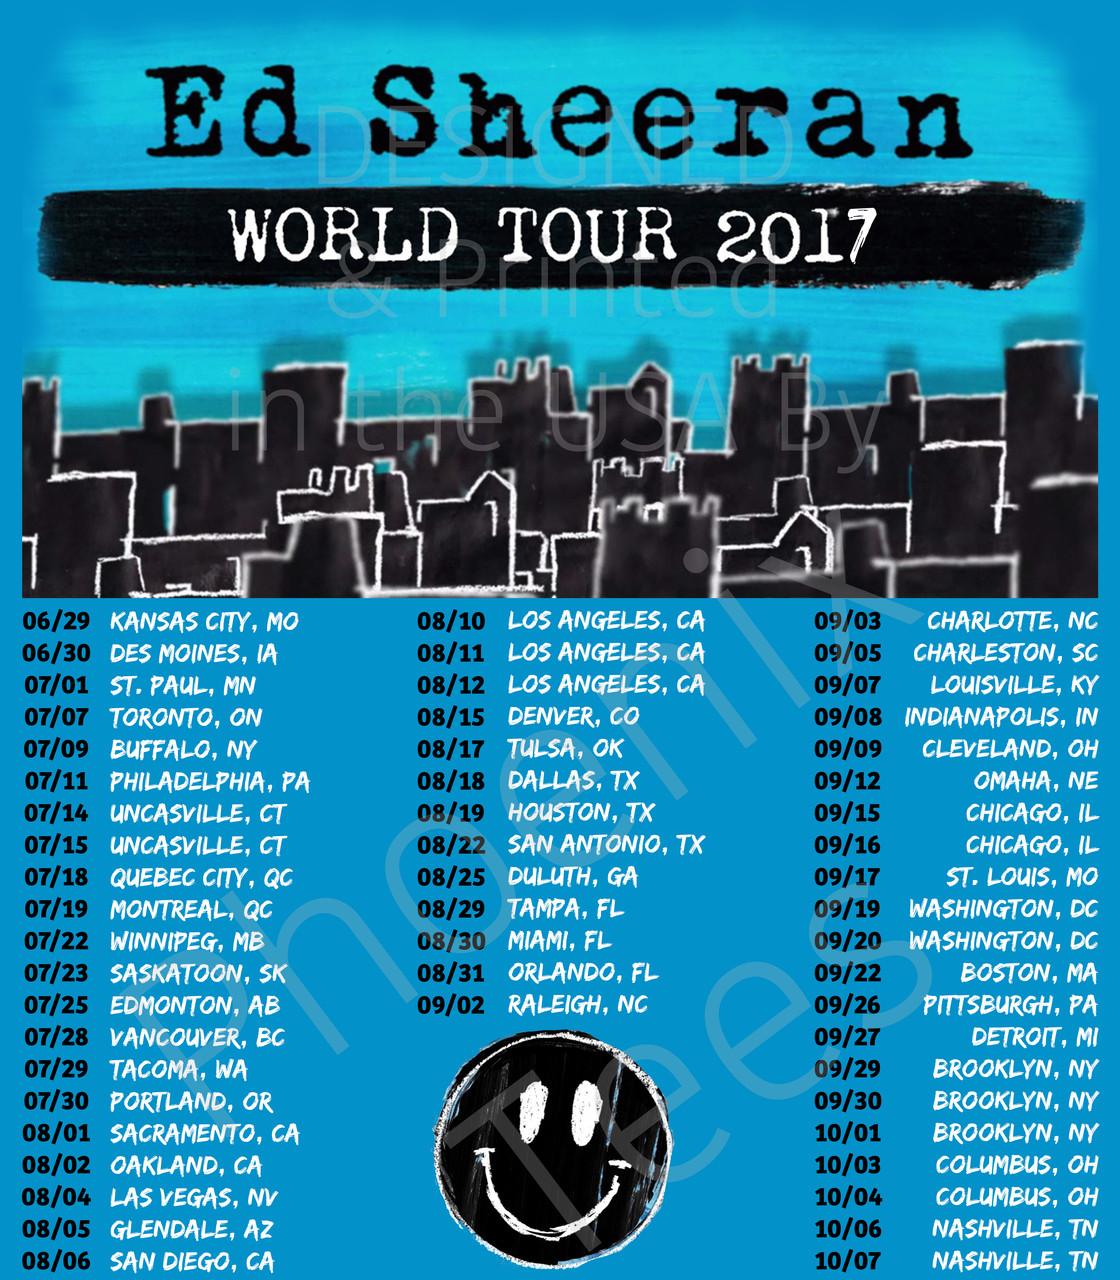 Ed Sheeran X World Tour